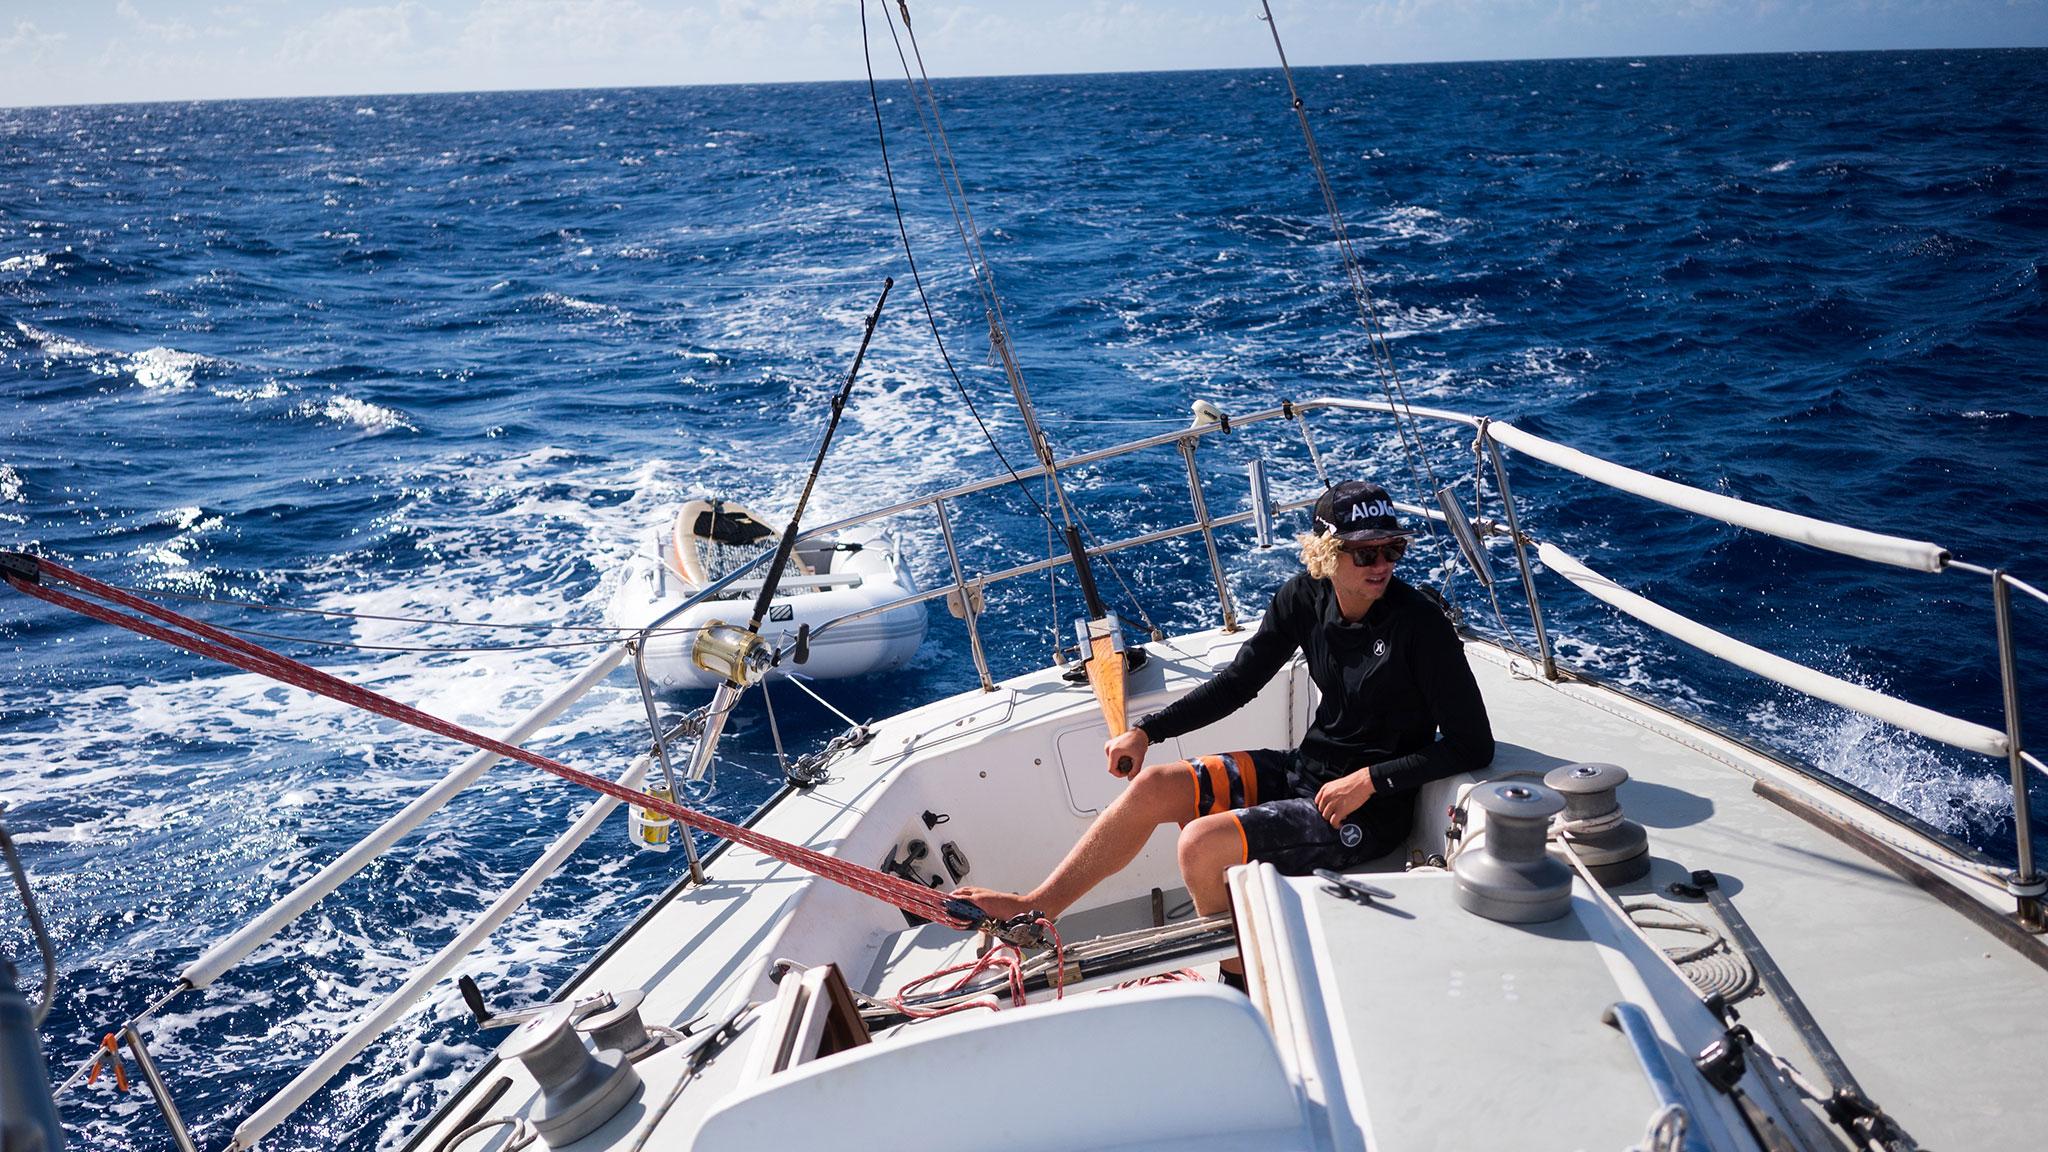 Sailing The Sea With John John Florence